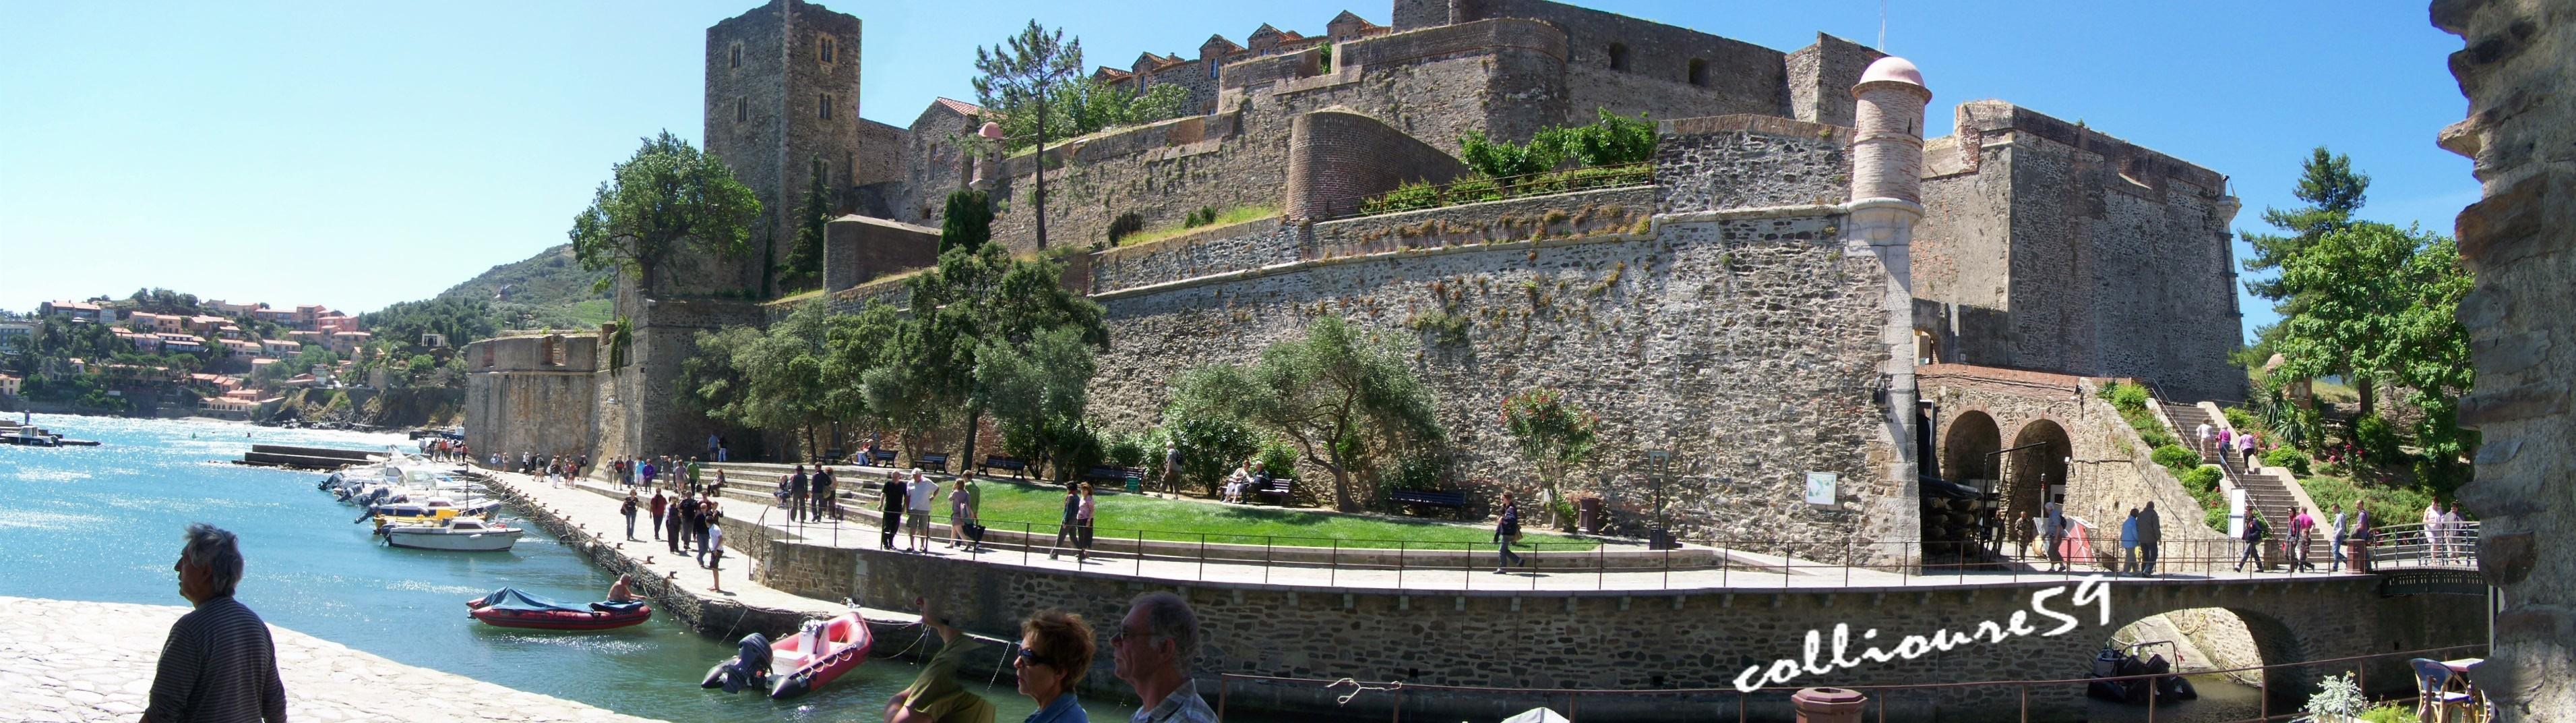 Photos de perpignan 66000 actuacity - Chateau royal collioure ...